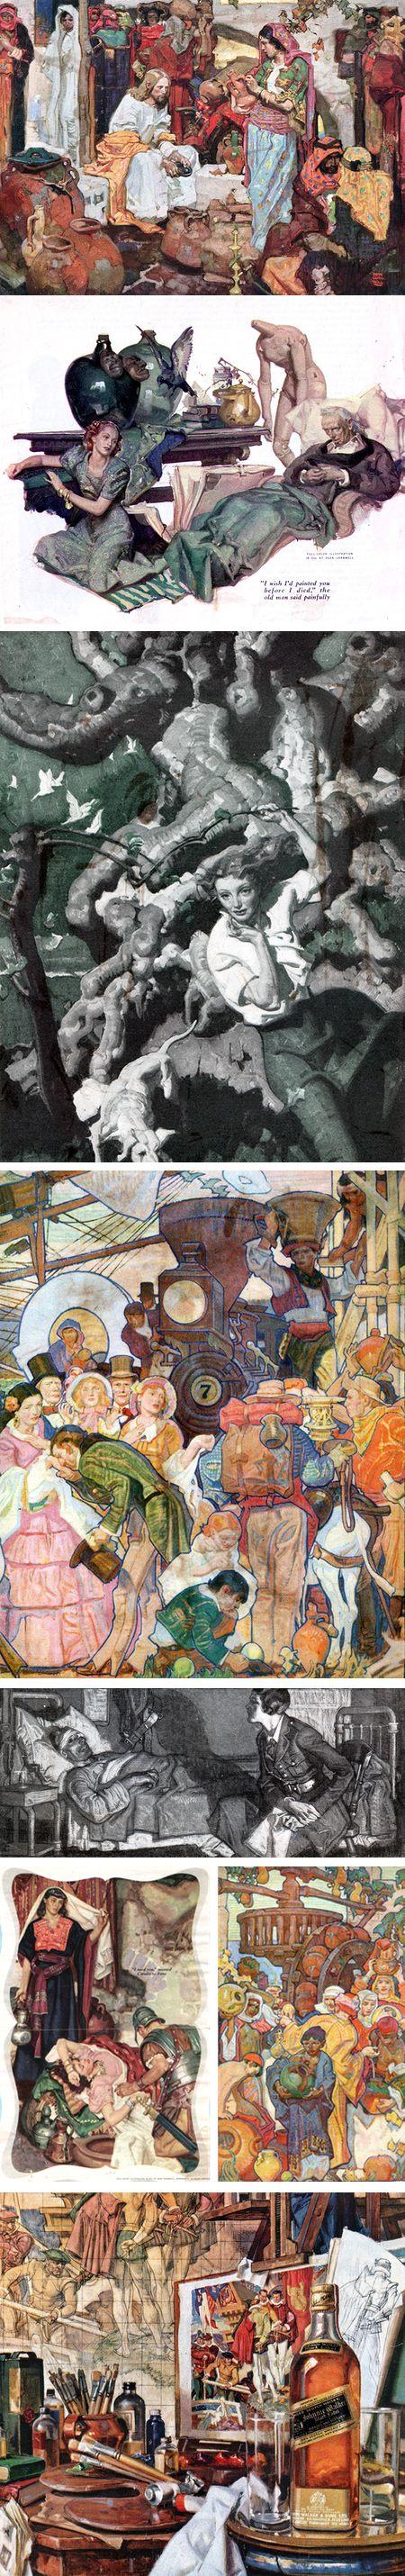 Dean Cornwell magazine illustrations